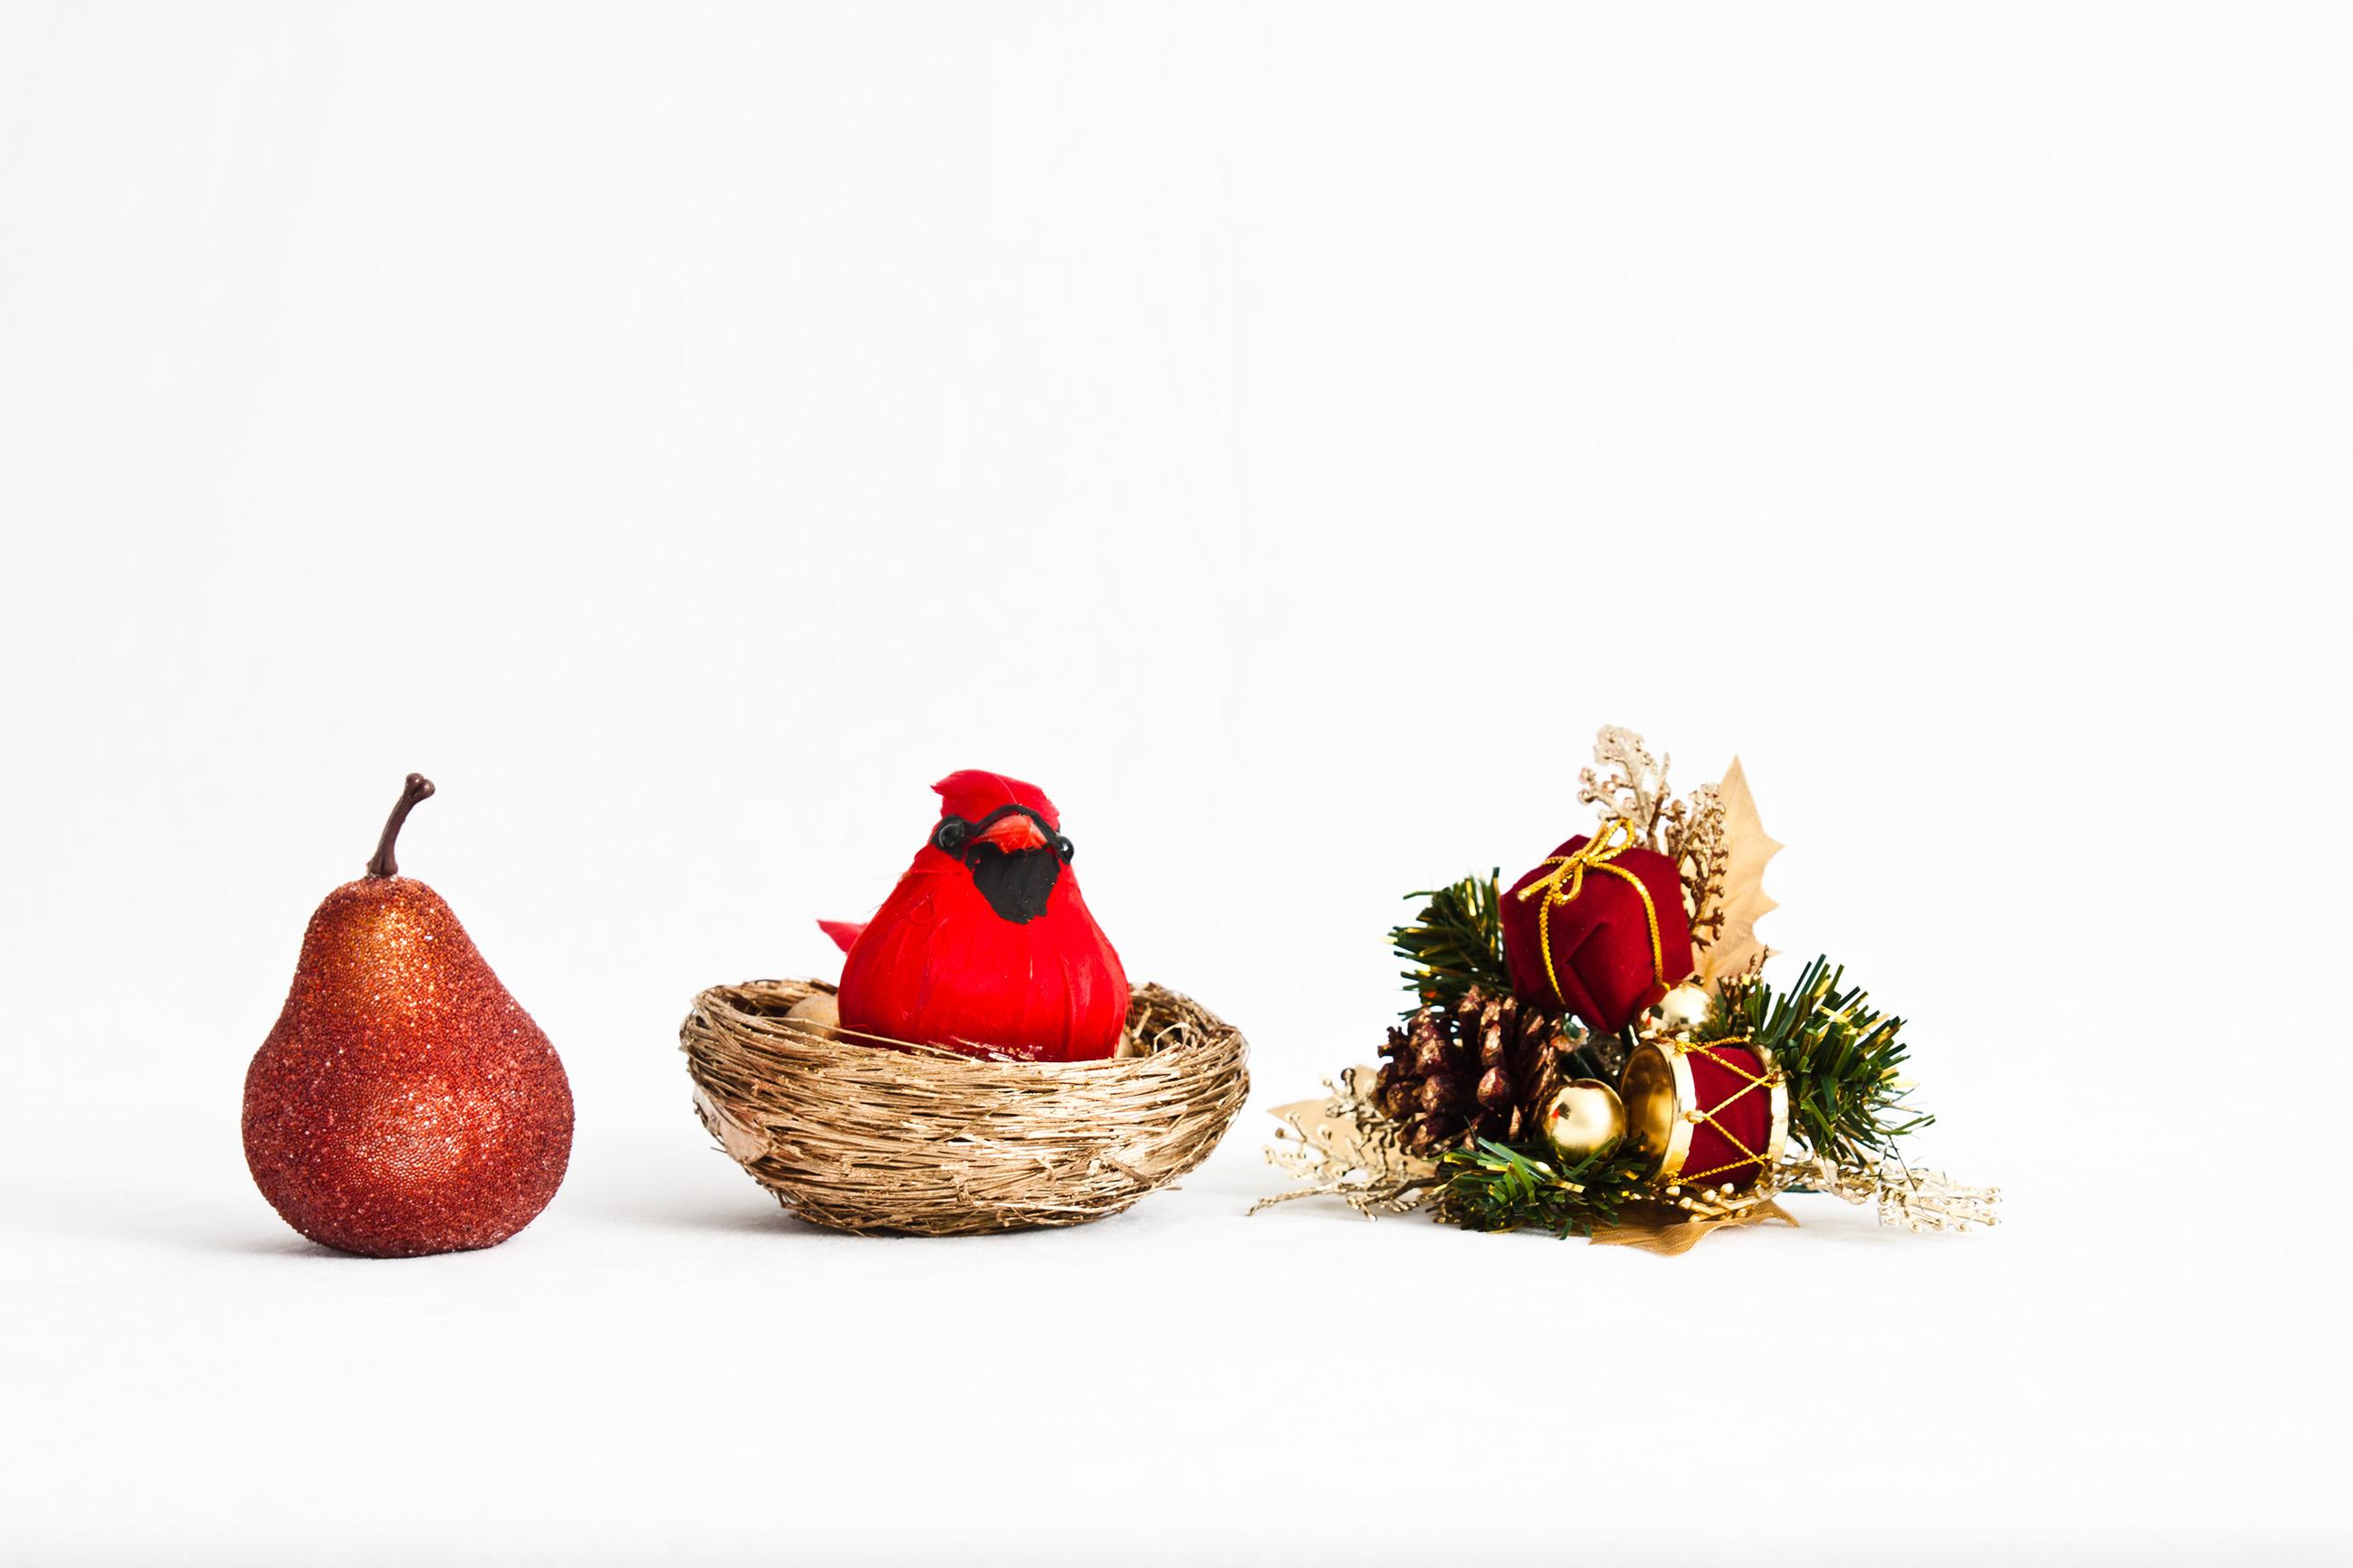 Christmas, Adorn, Shine, Merry, New-year, HQ Photo